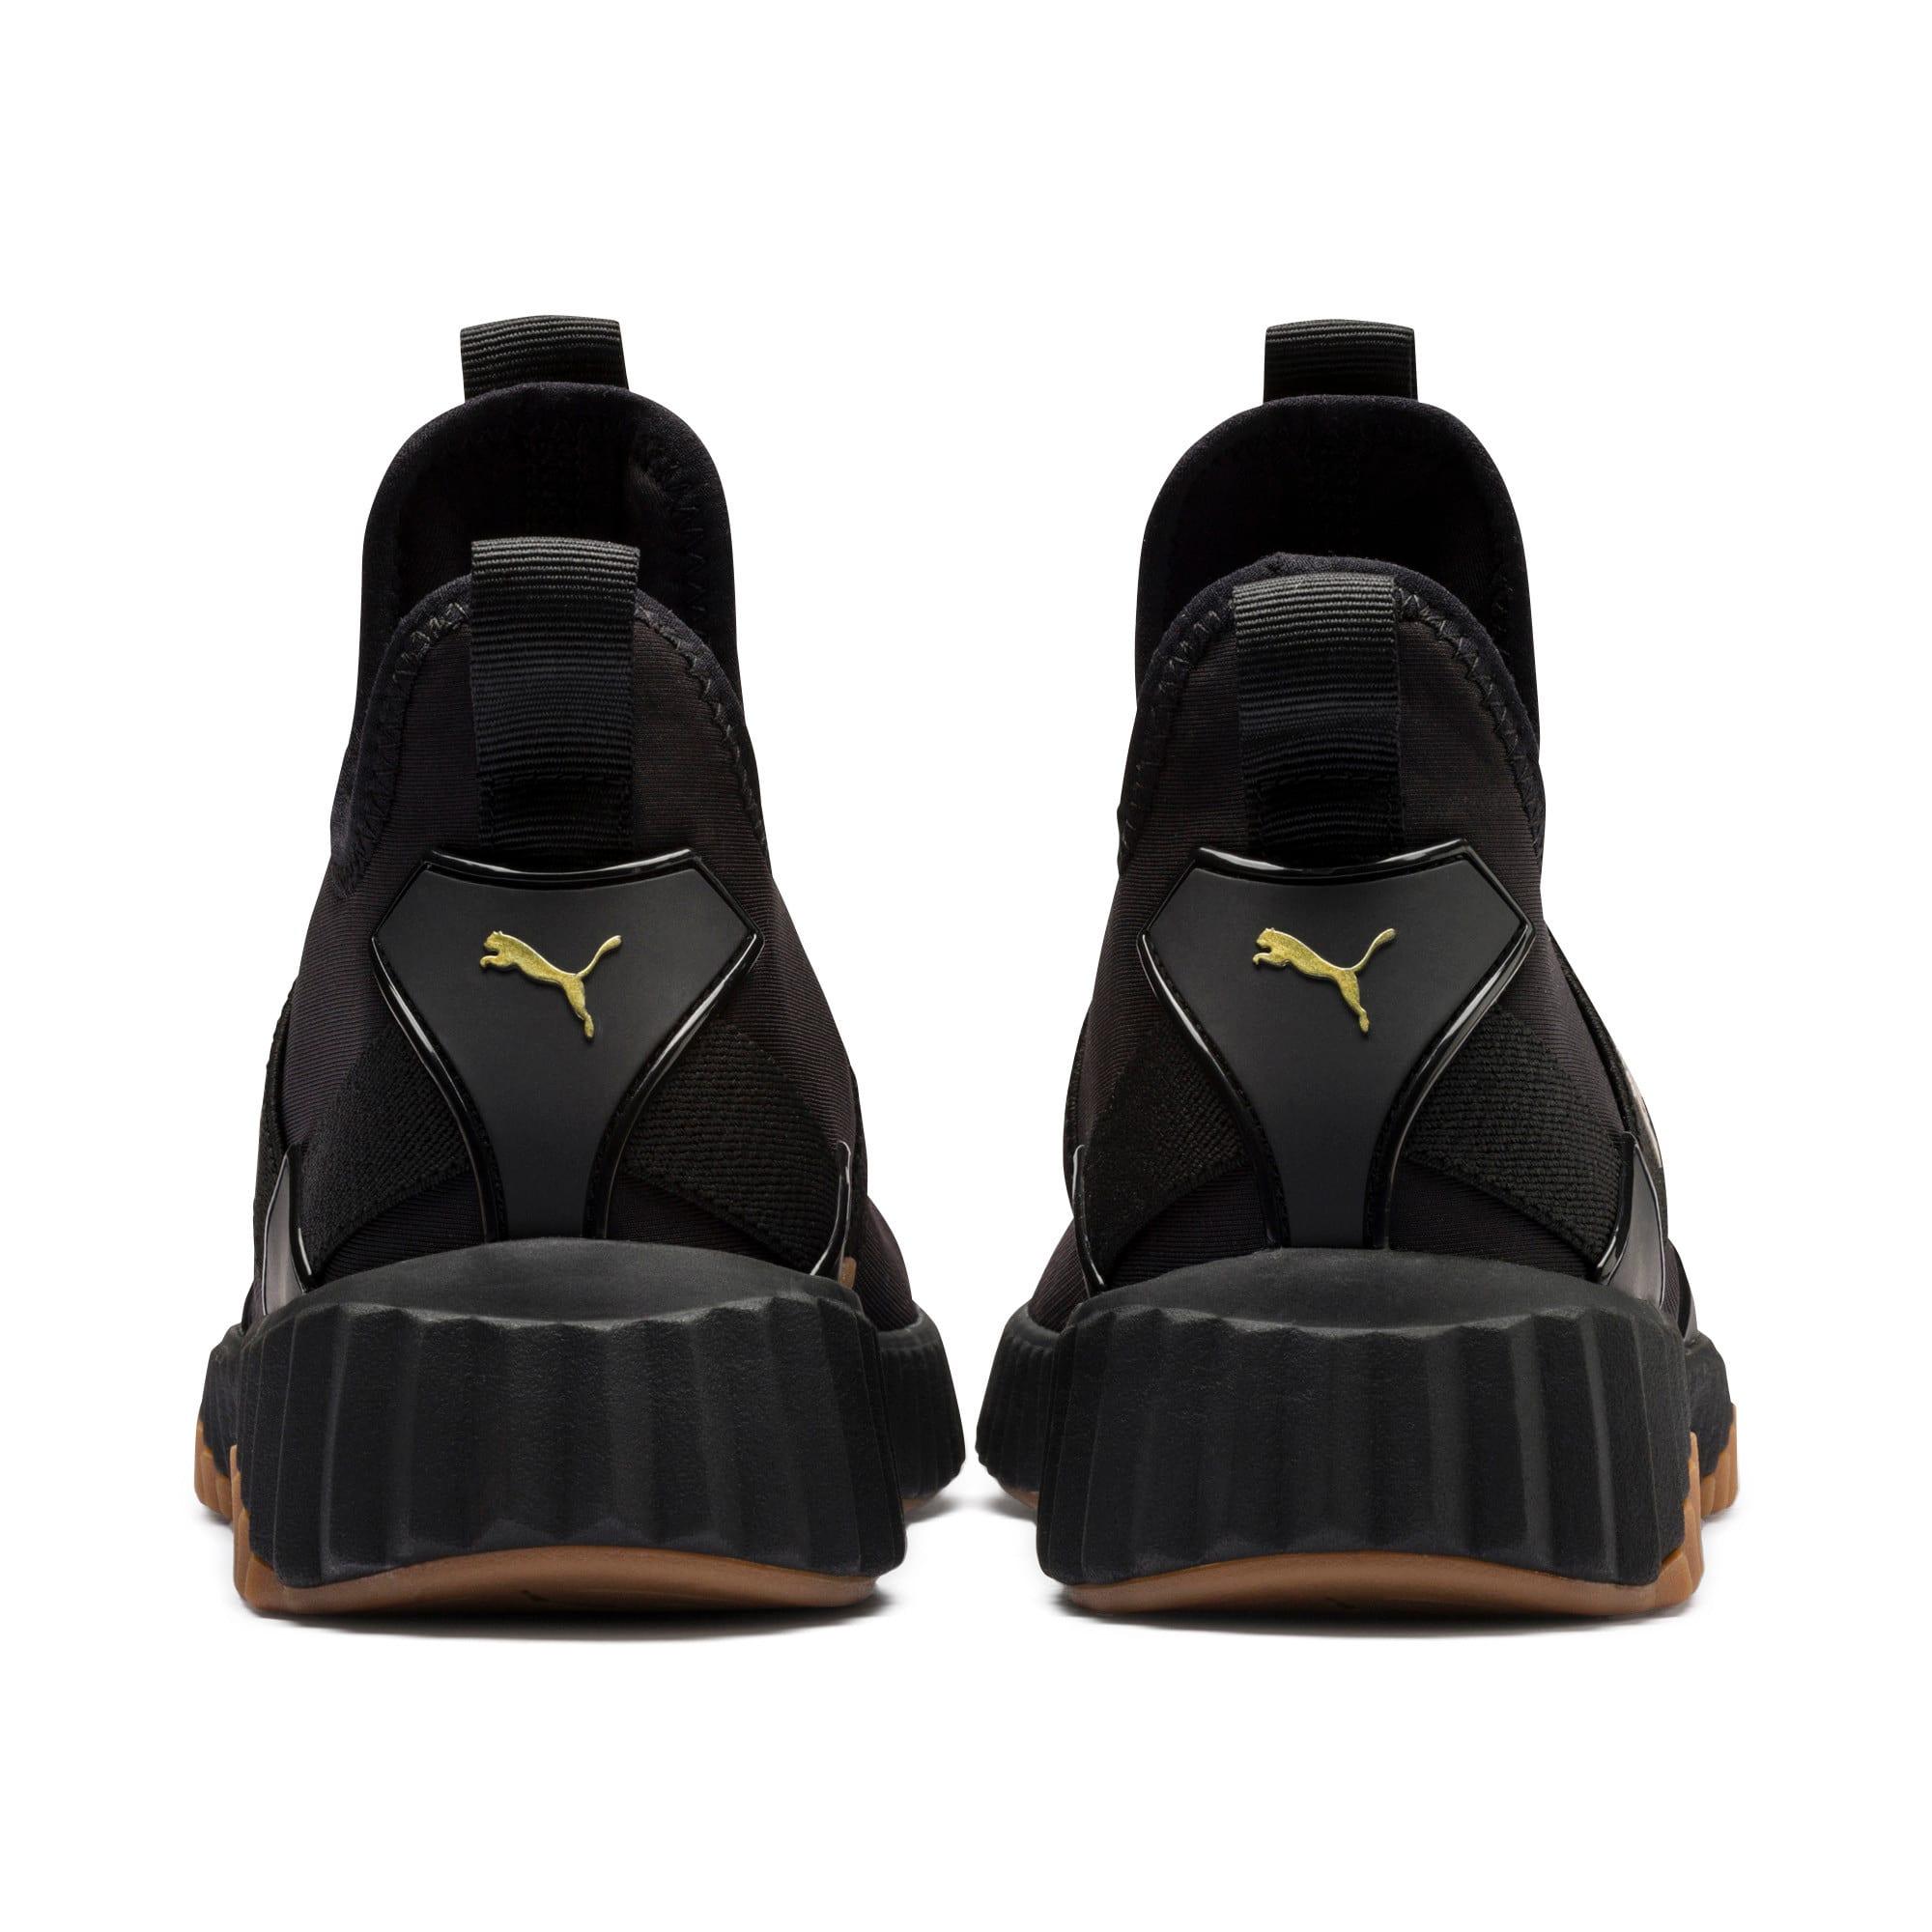 Thumbnail 4 of Defy Mid Sparkle Damen Sneaker, Puma Black-Metallic Gold, medium